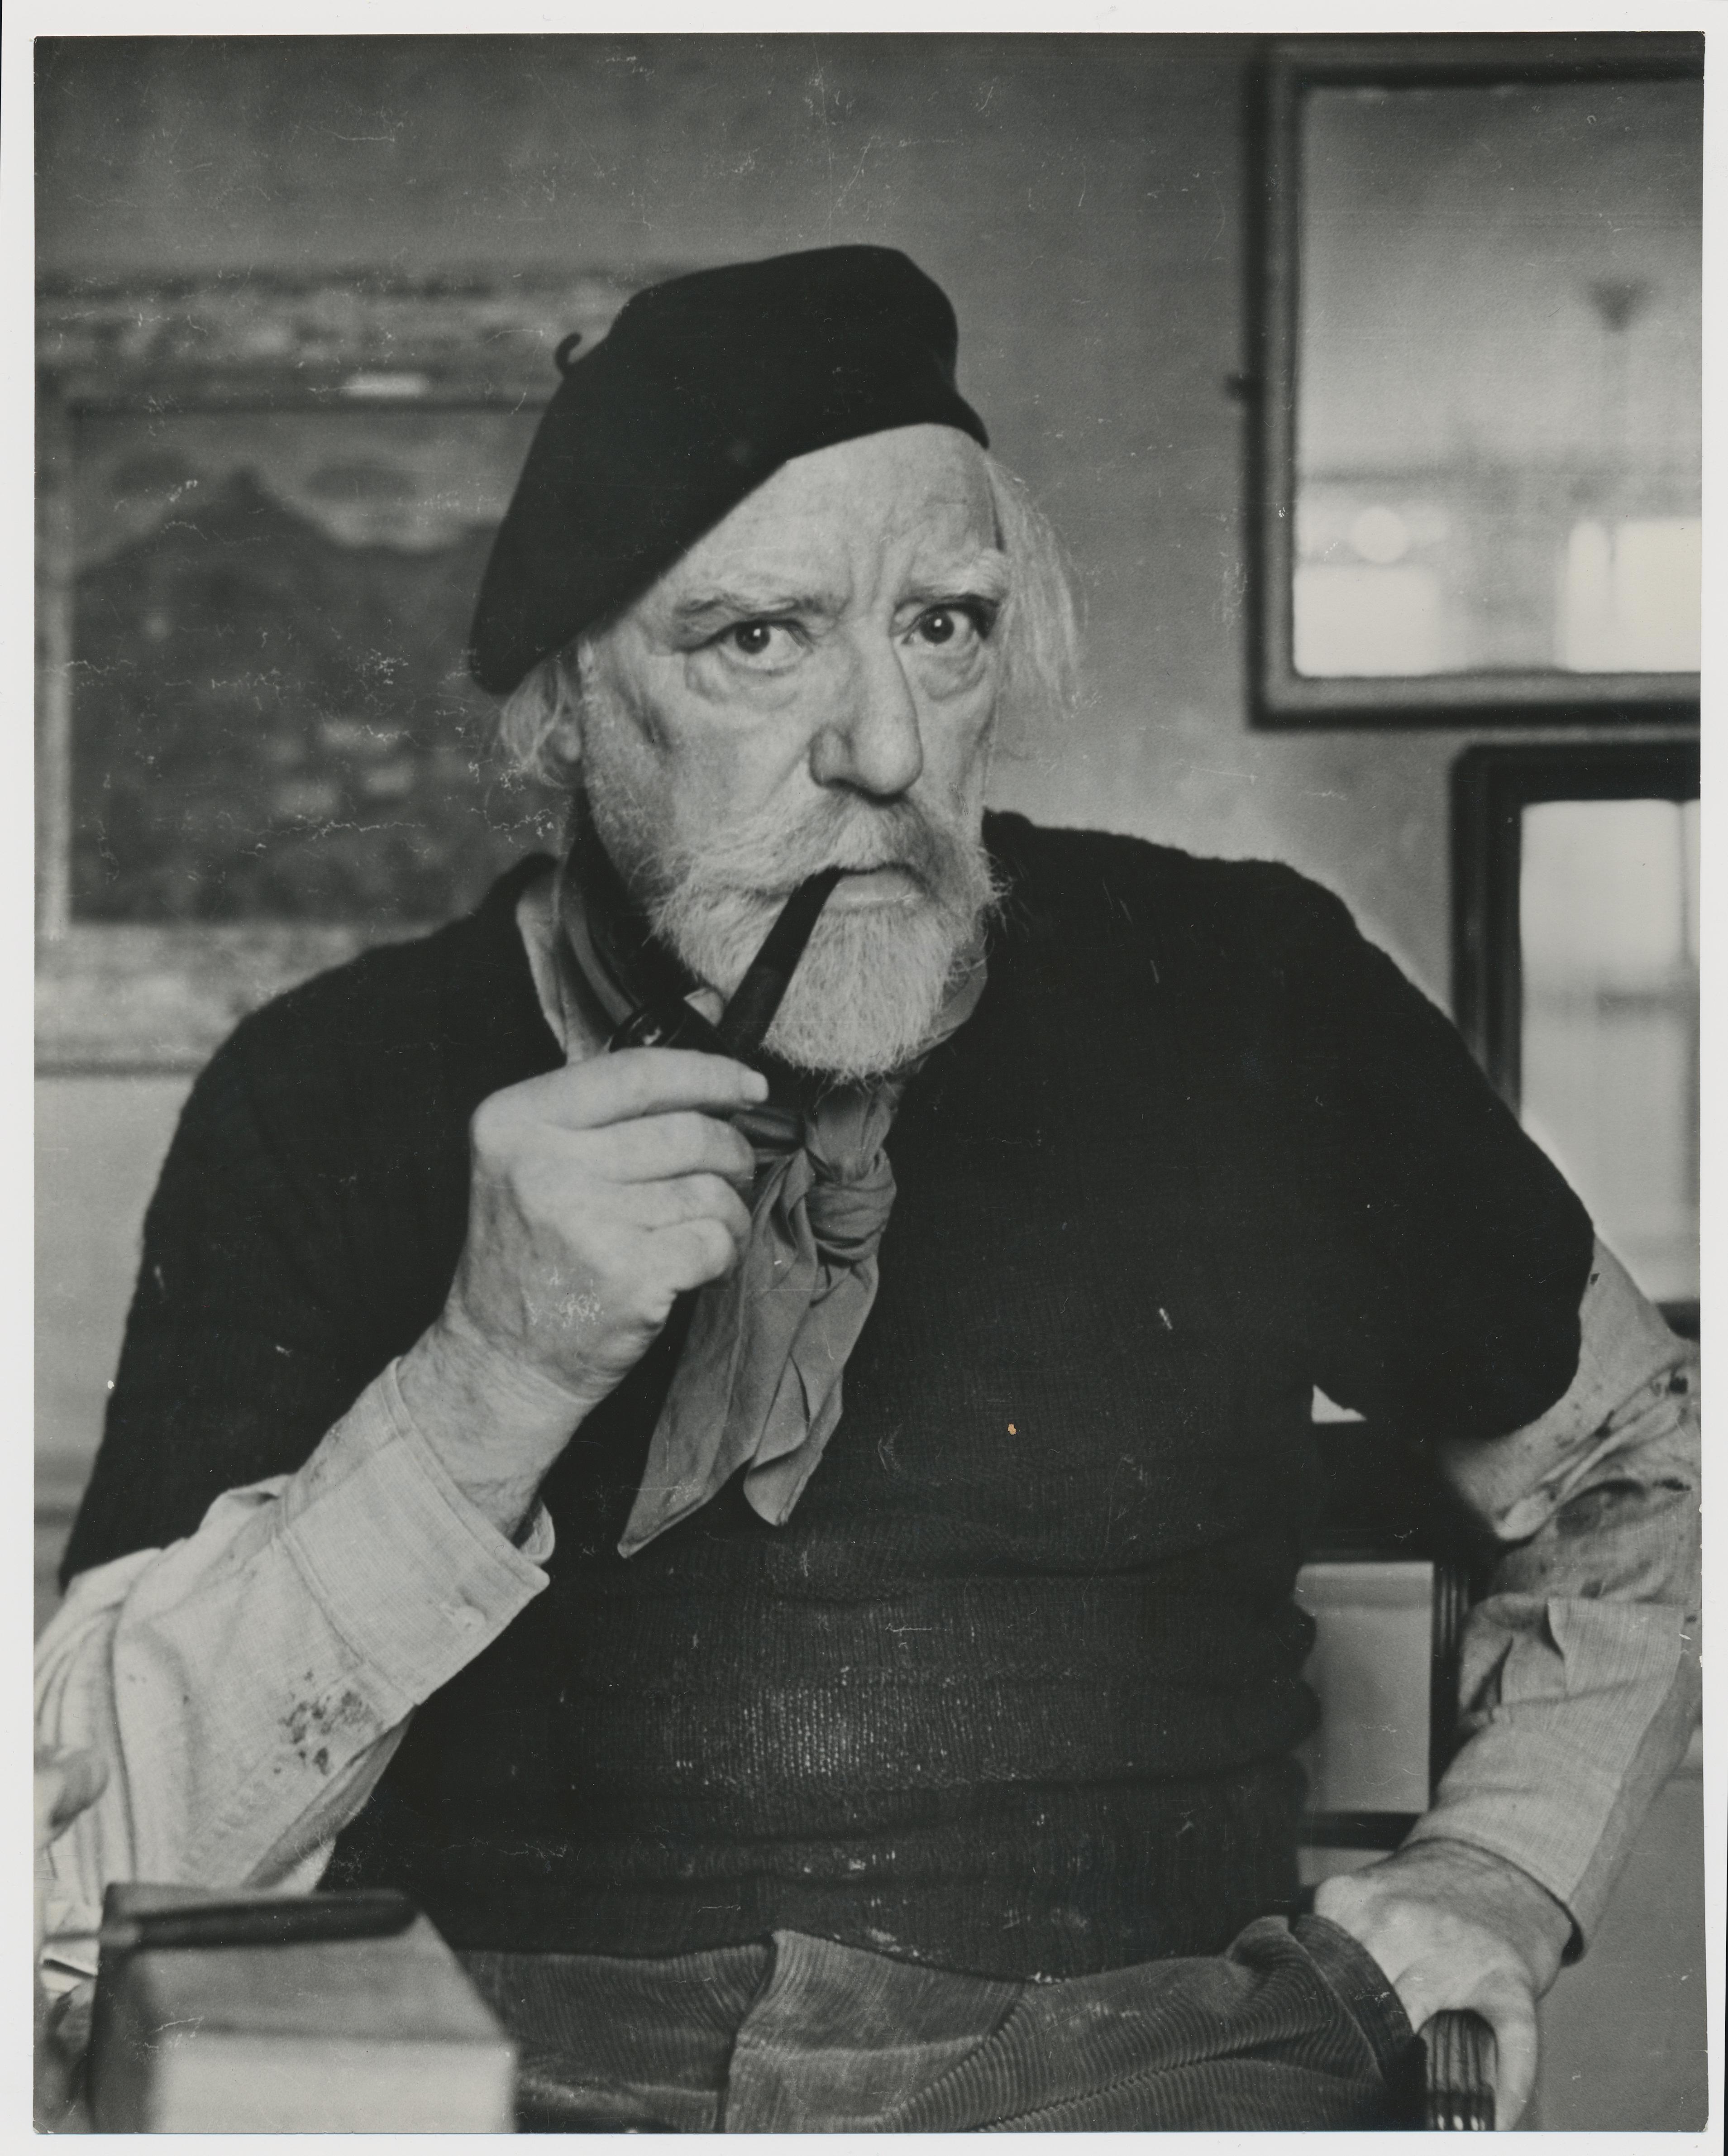 Portrait of painter Augustus John, by Allan Chappelow, England 1953.